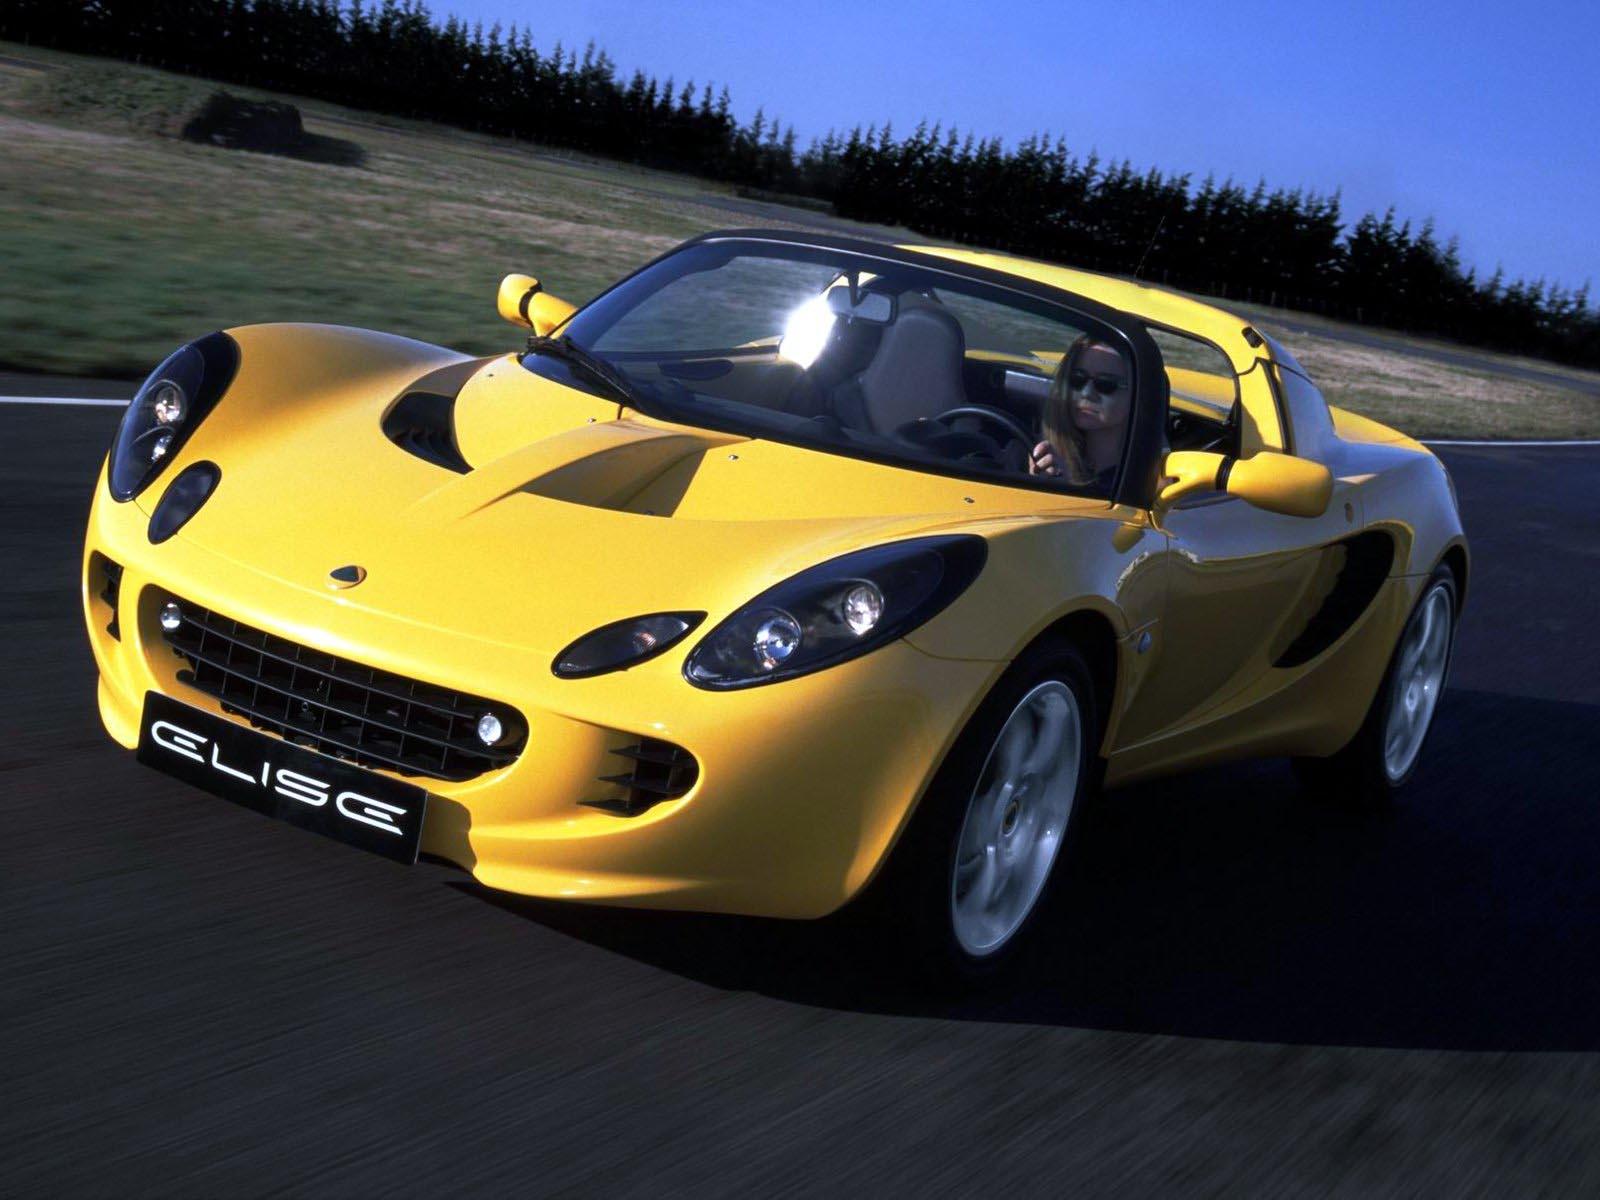 https://www.conceptcarz.com/images/Lotus/2005_lotus_elise_yellow_concept_01.jpg